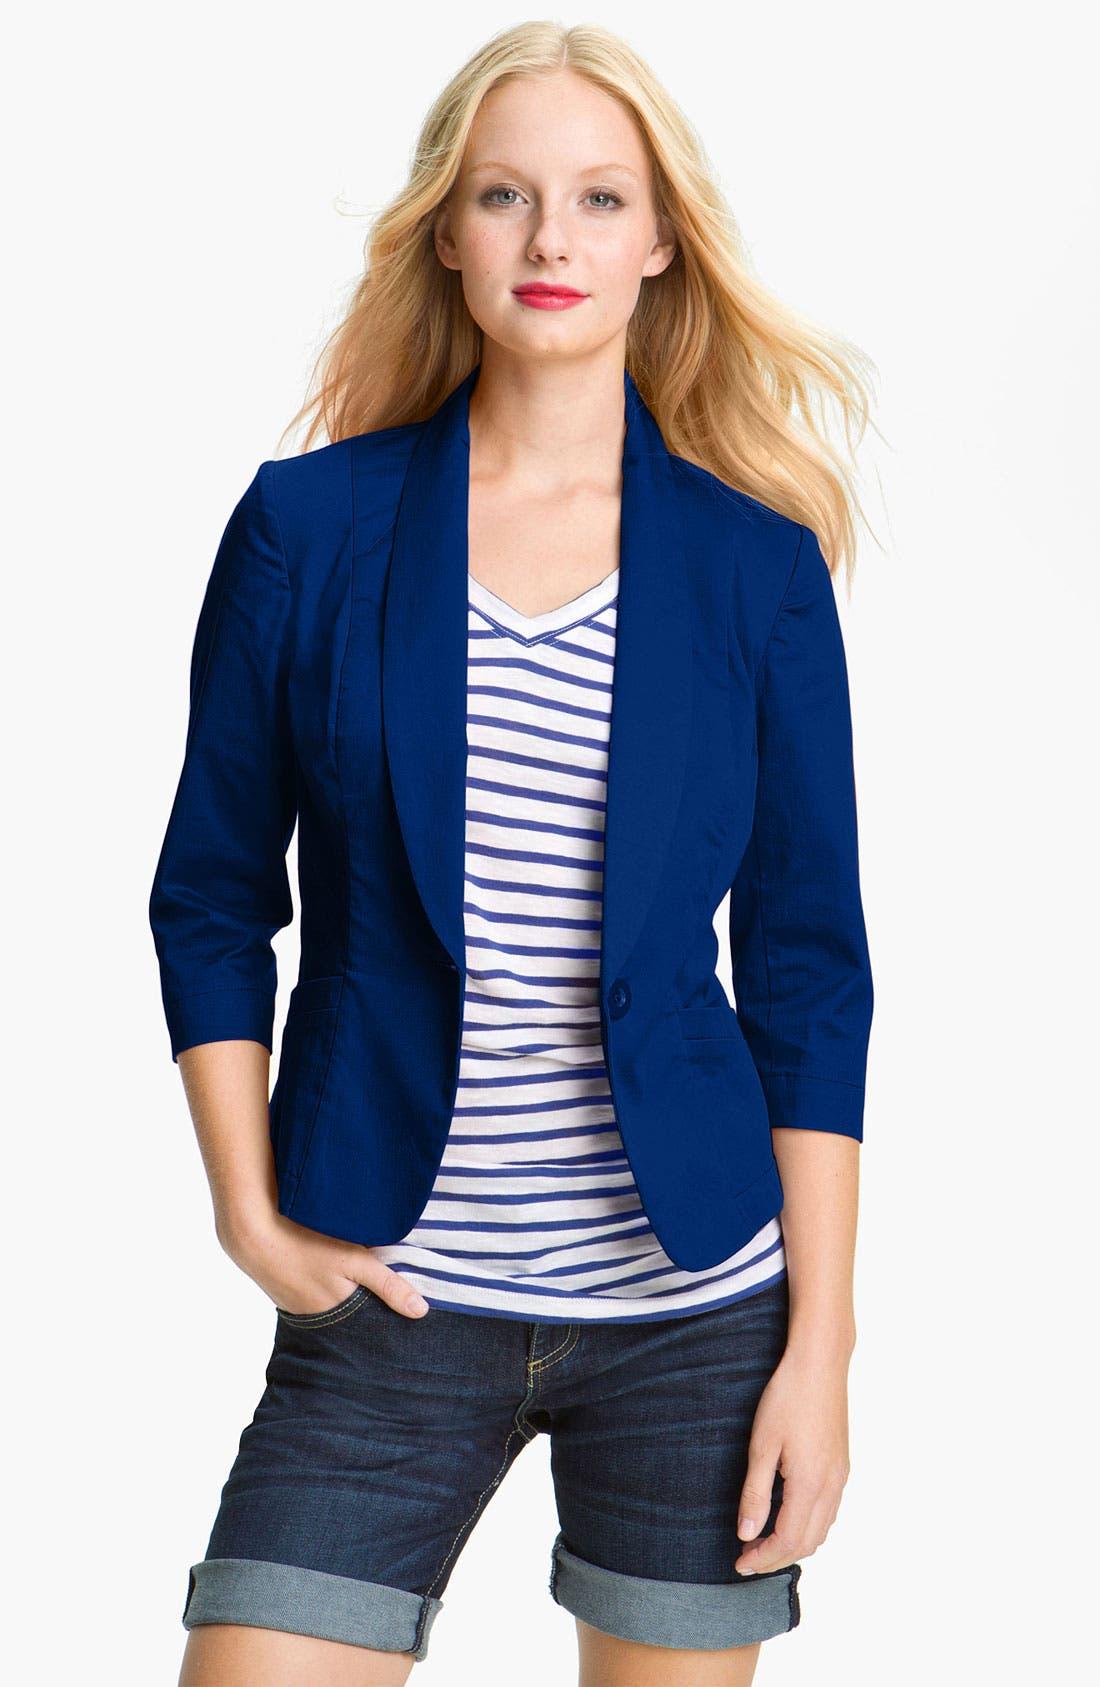 Main Image - Ambition One Button Twill Jacket